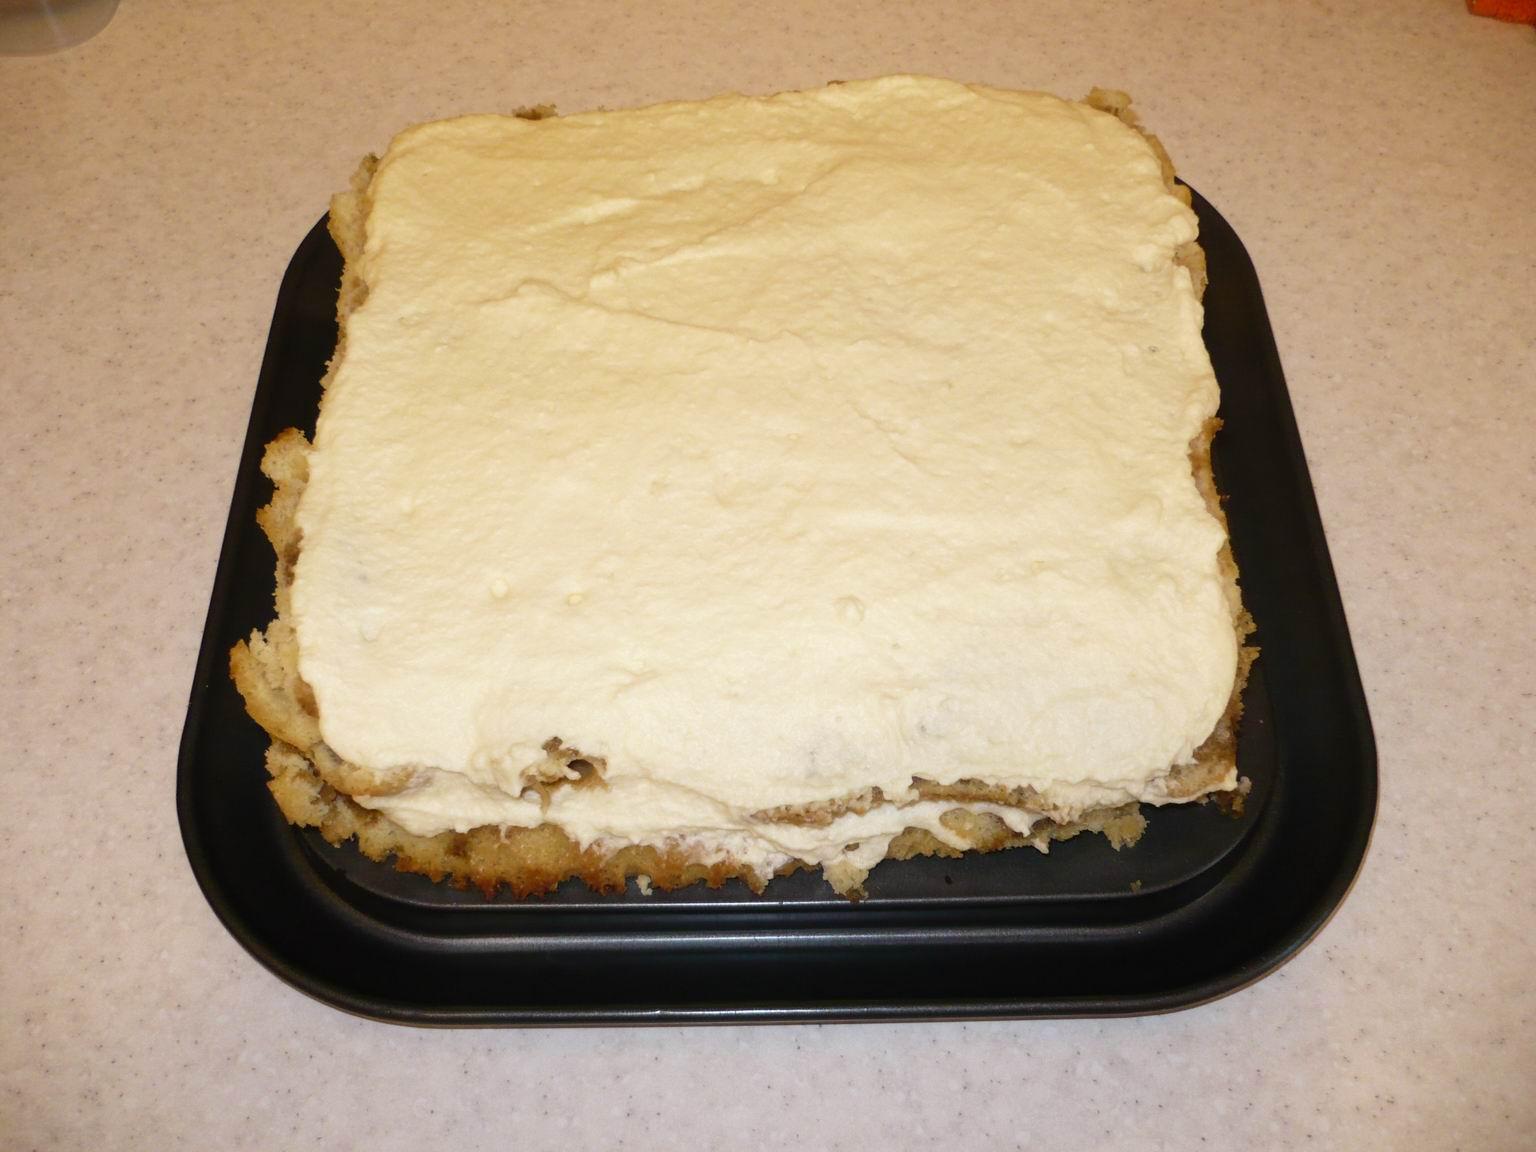 Рецепт тирамису рецепт с фото пошагово в домашних условиях